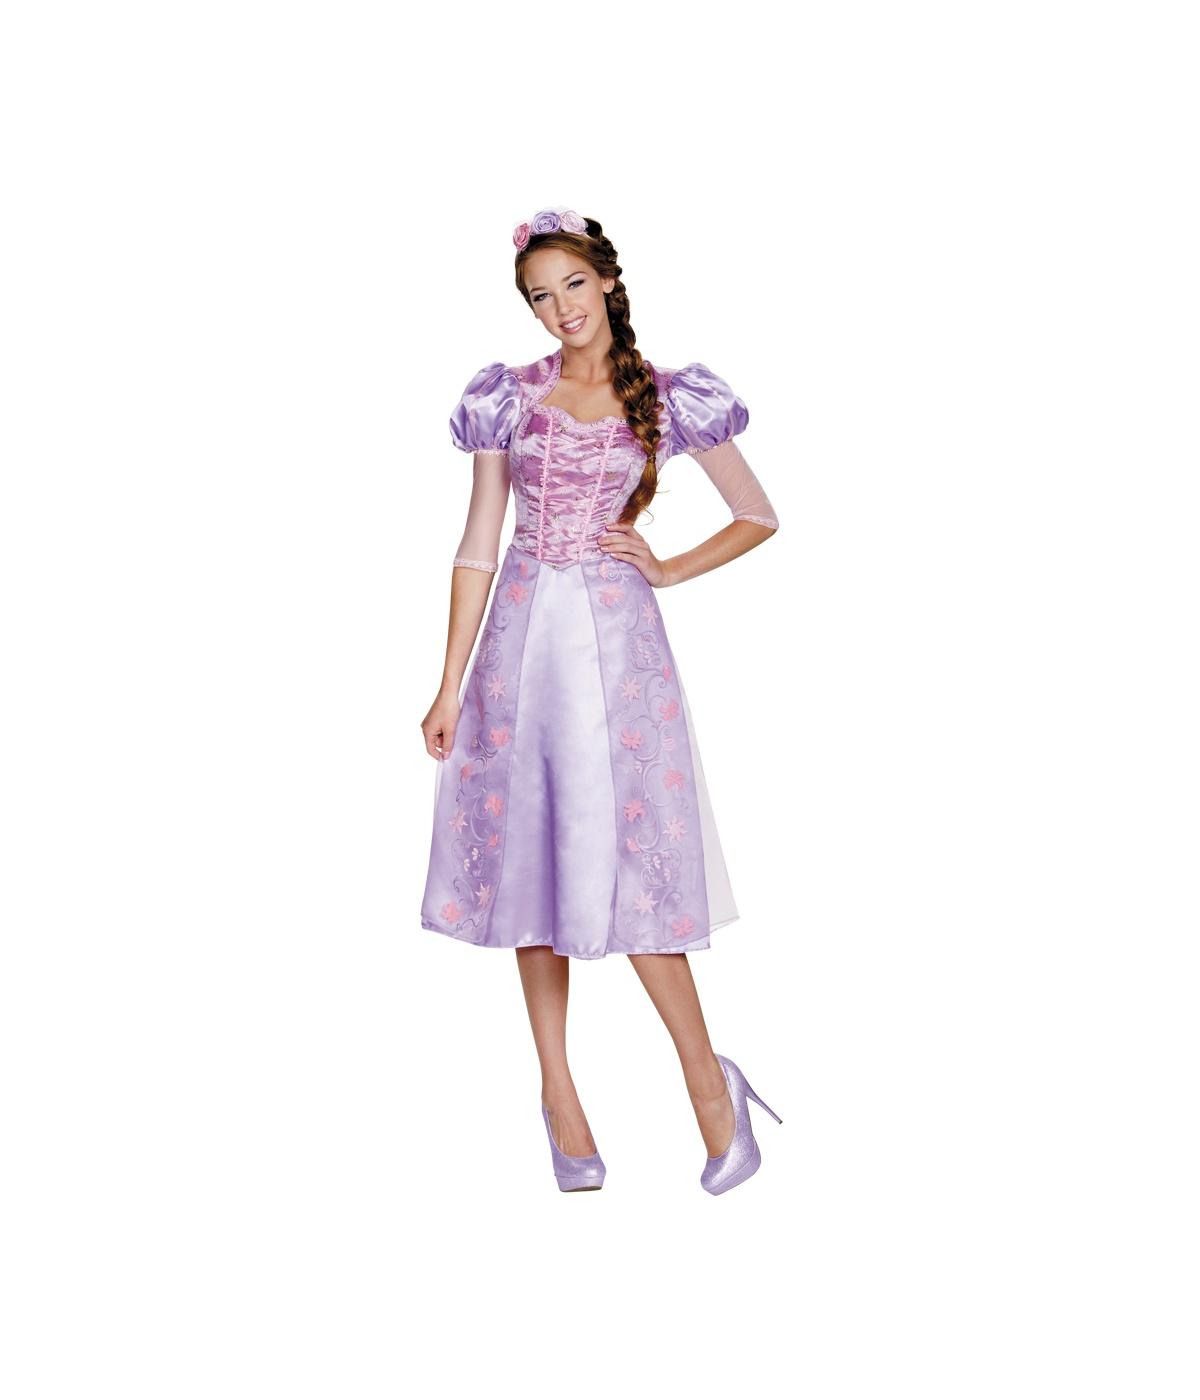 sc 1 st  Wonder Costumes & Disney Princess Rapunzel Womens Dress Costume - Princess Costumes